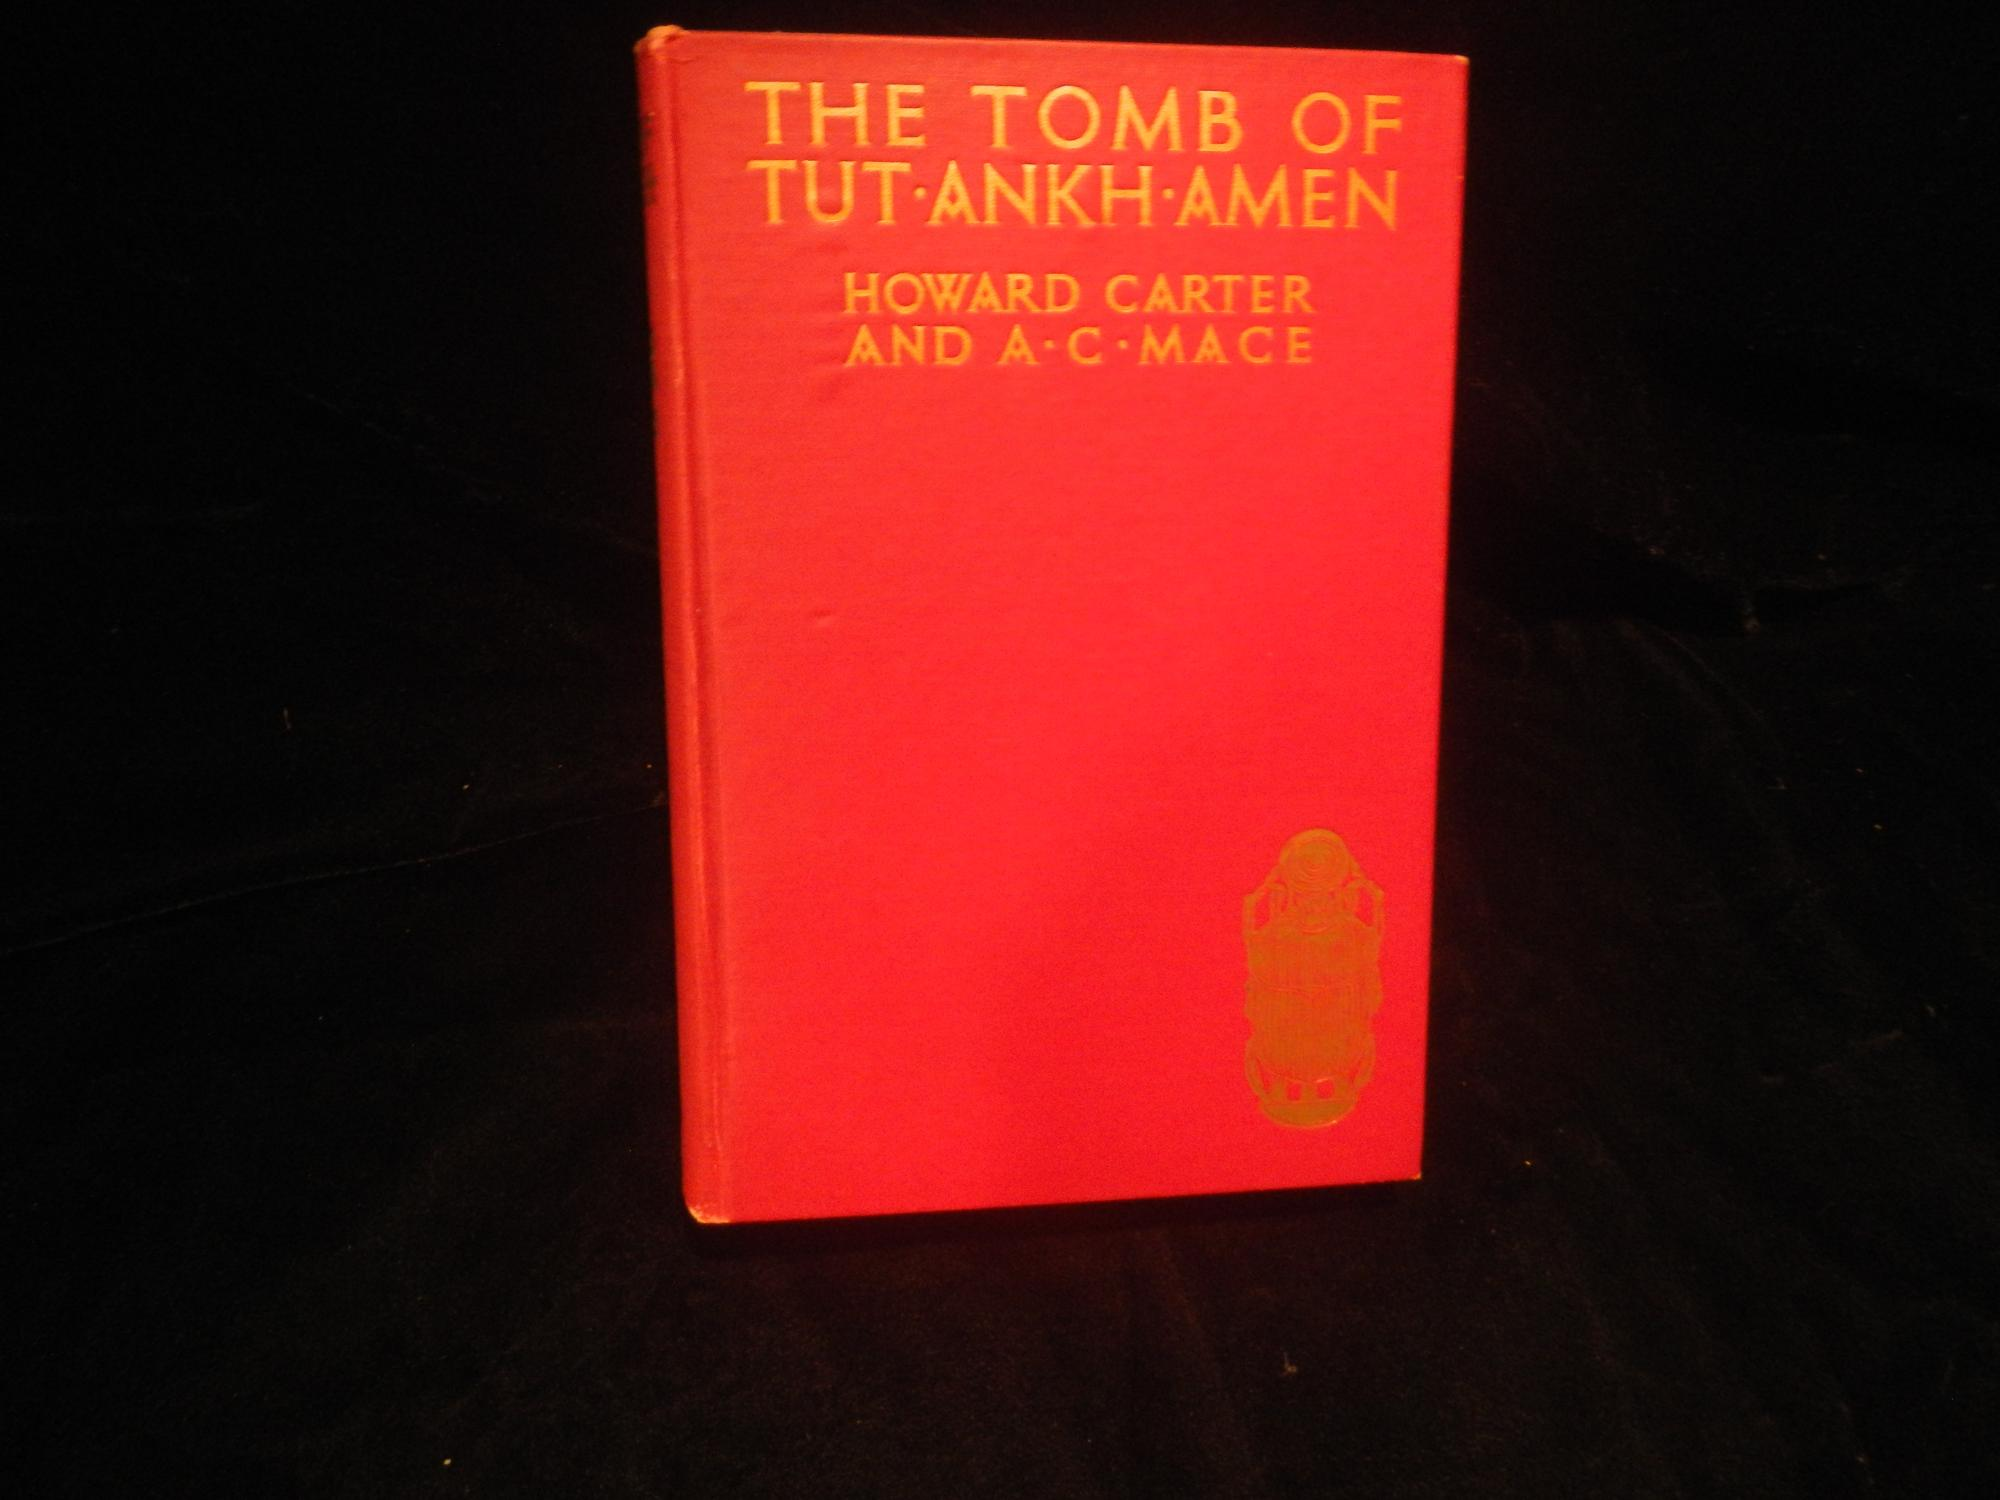 The Tomb of Tutankhamen: Howard Carter and A.C. Mace